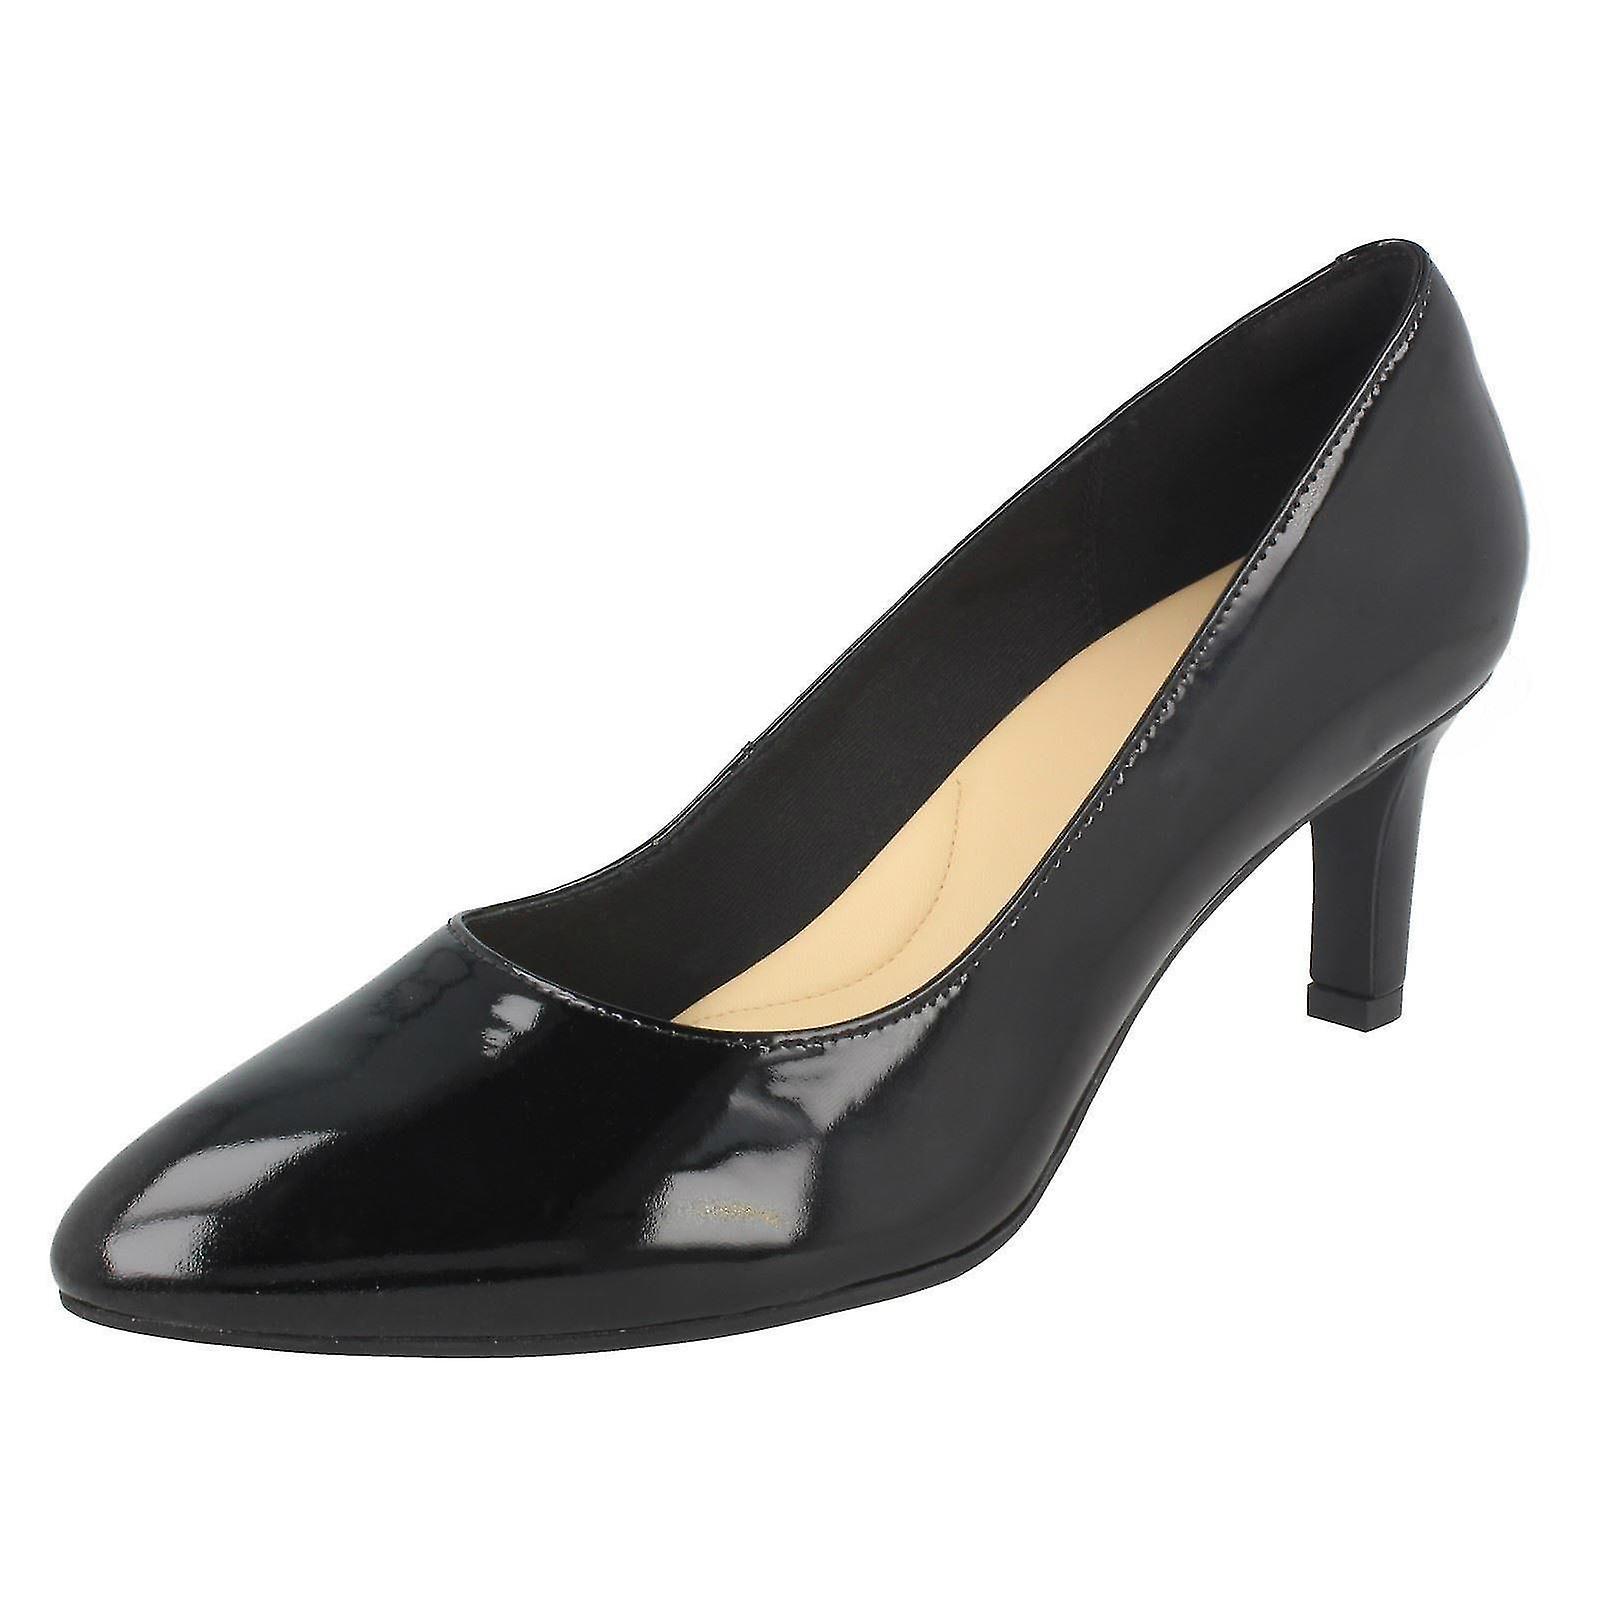 Damen Clarks texturiert Gericht Schuhe Calla Rose - Schwarz Lack - UK Size 7D - EU Größe 41 - US Größe 9,5 M